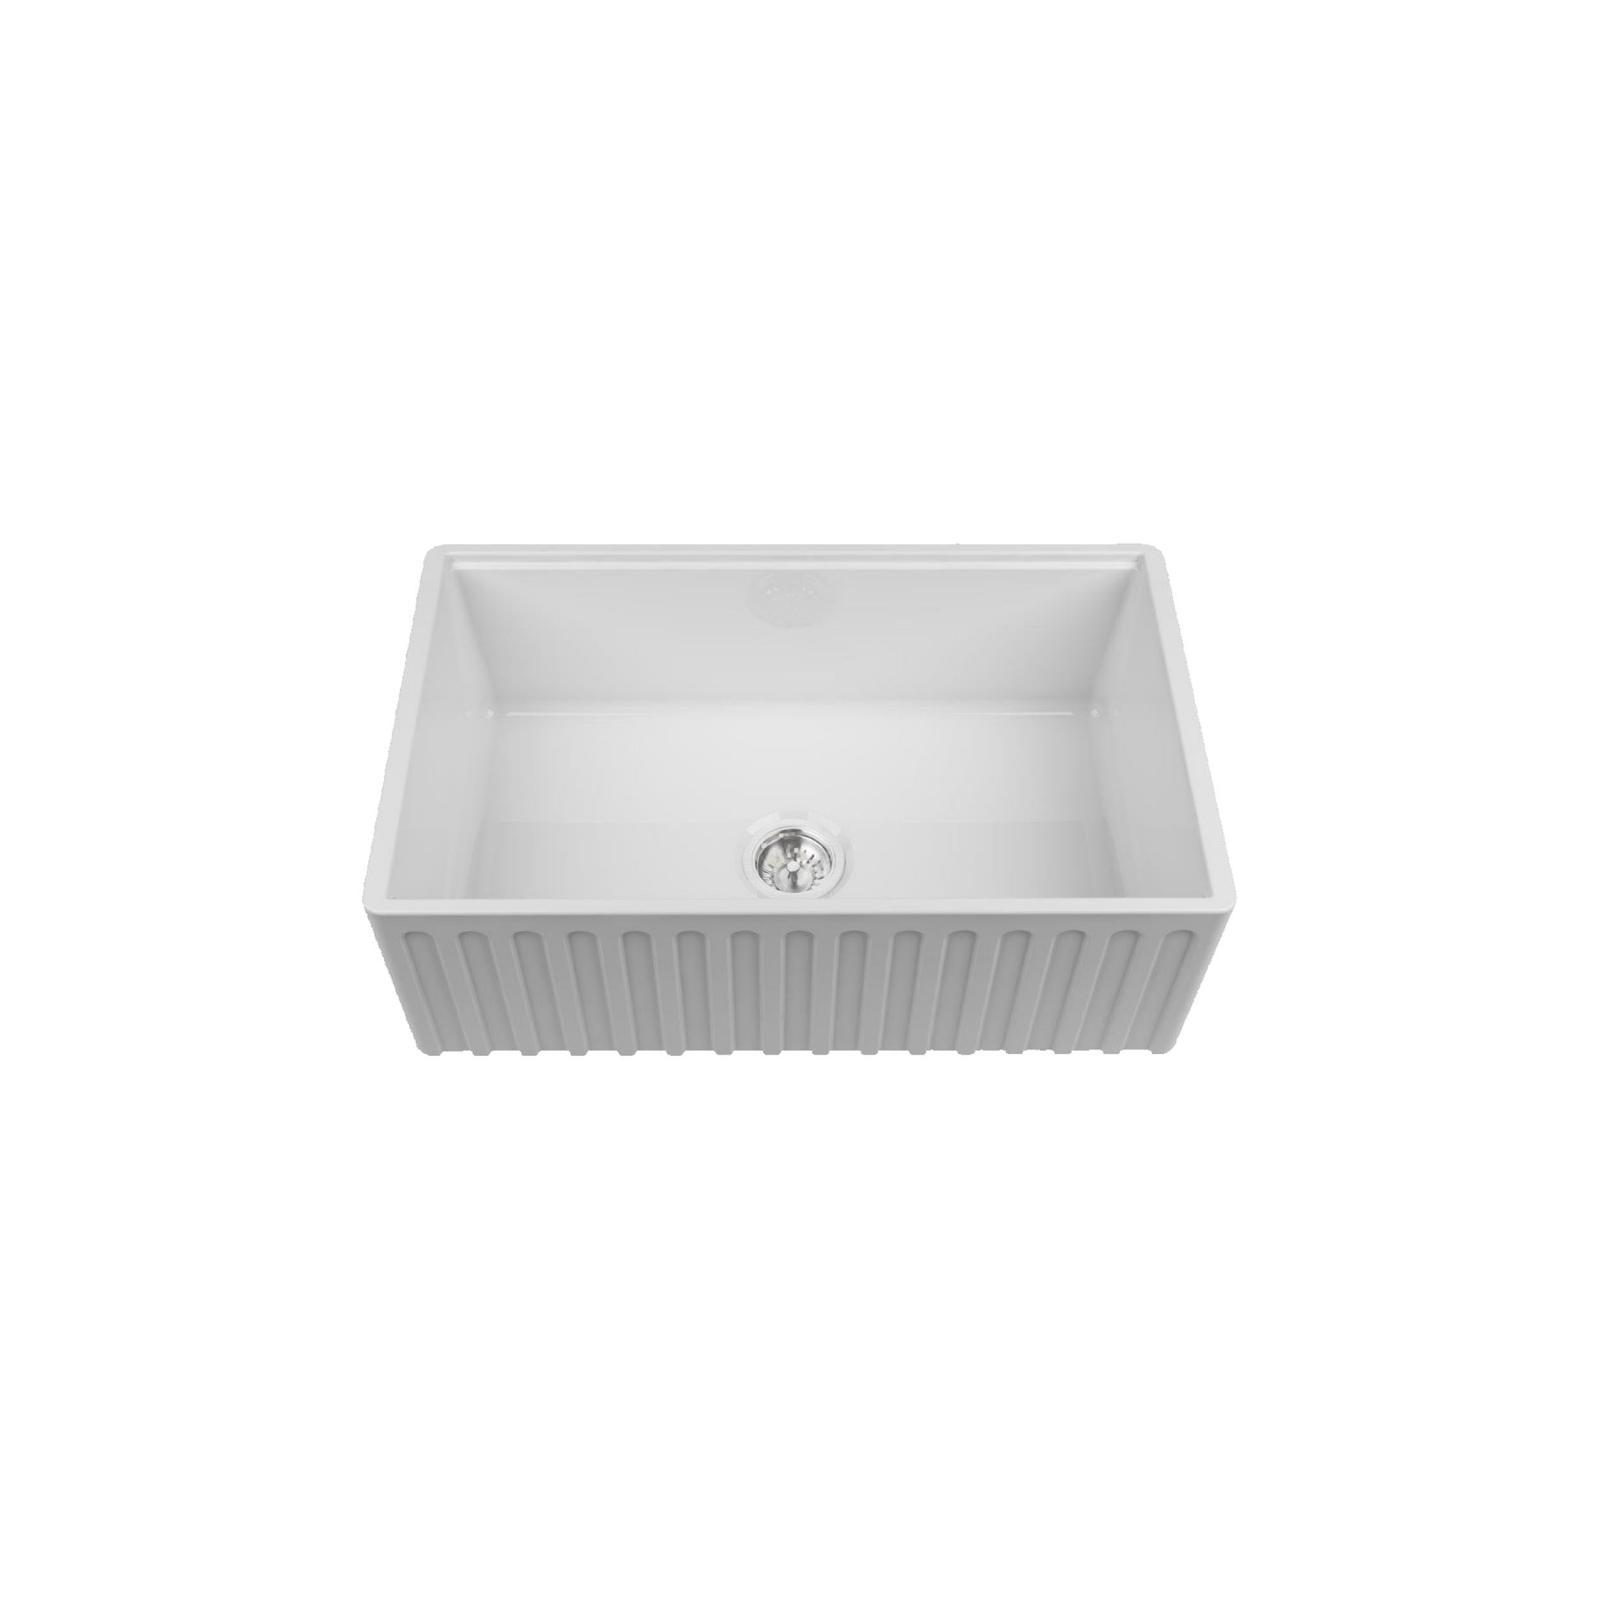 High-quality sink Louis Le Grand I - single bowl, ceramic